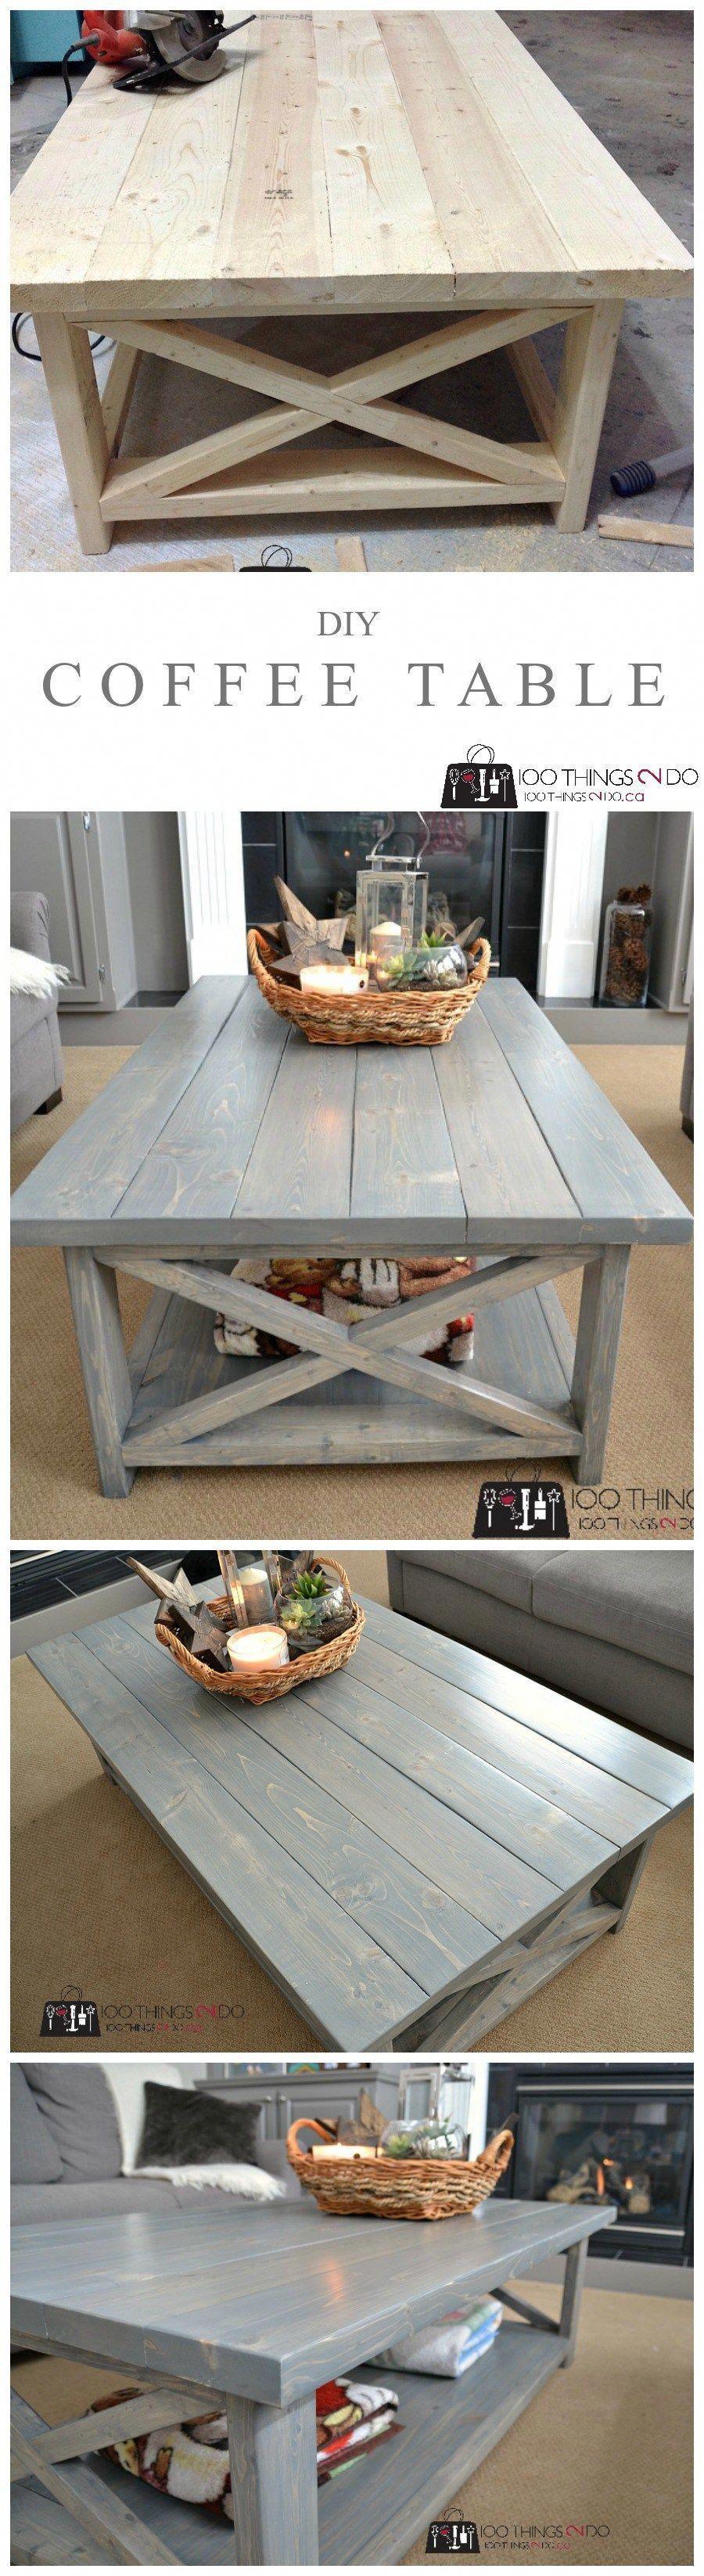 Diy rustic x coffee table p woodworkingprojectshomemade